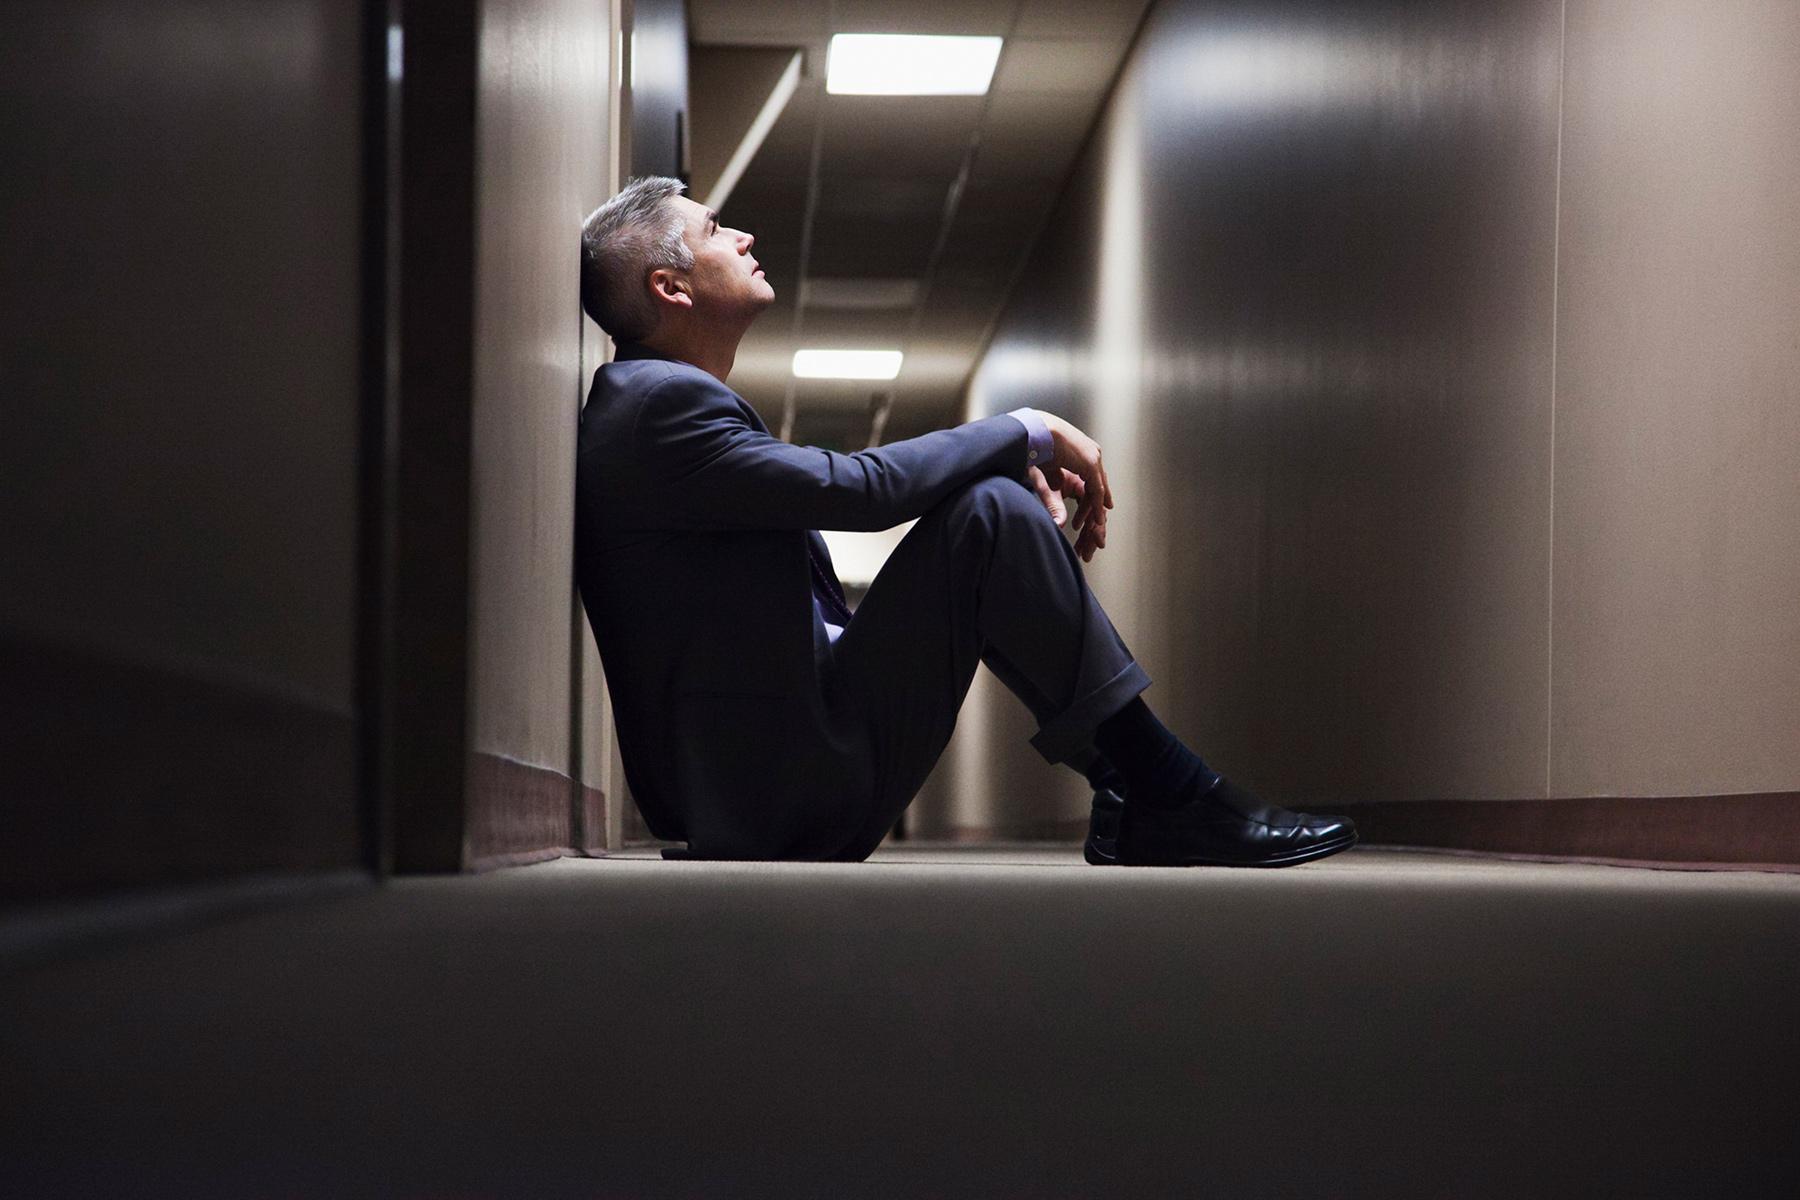 depressed man in hallway